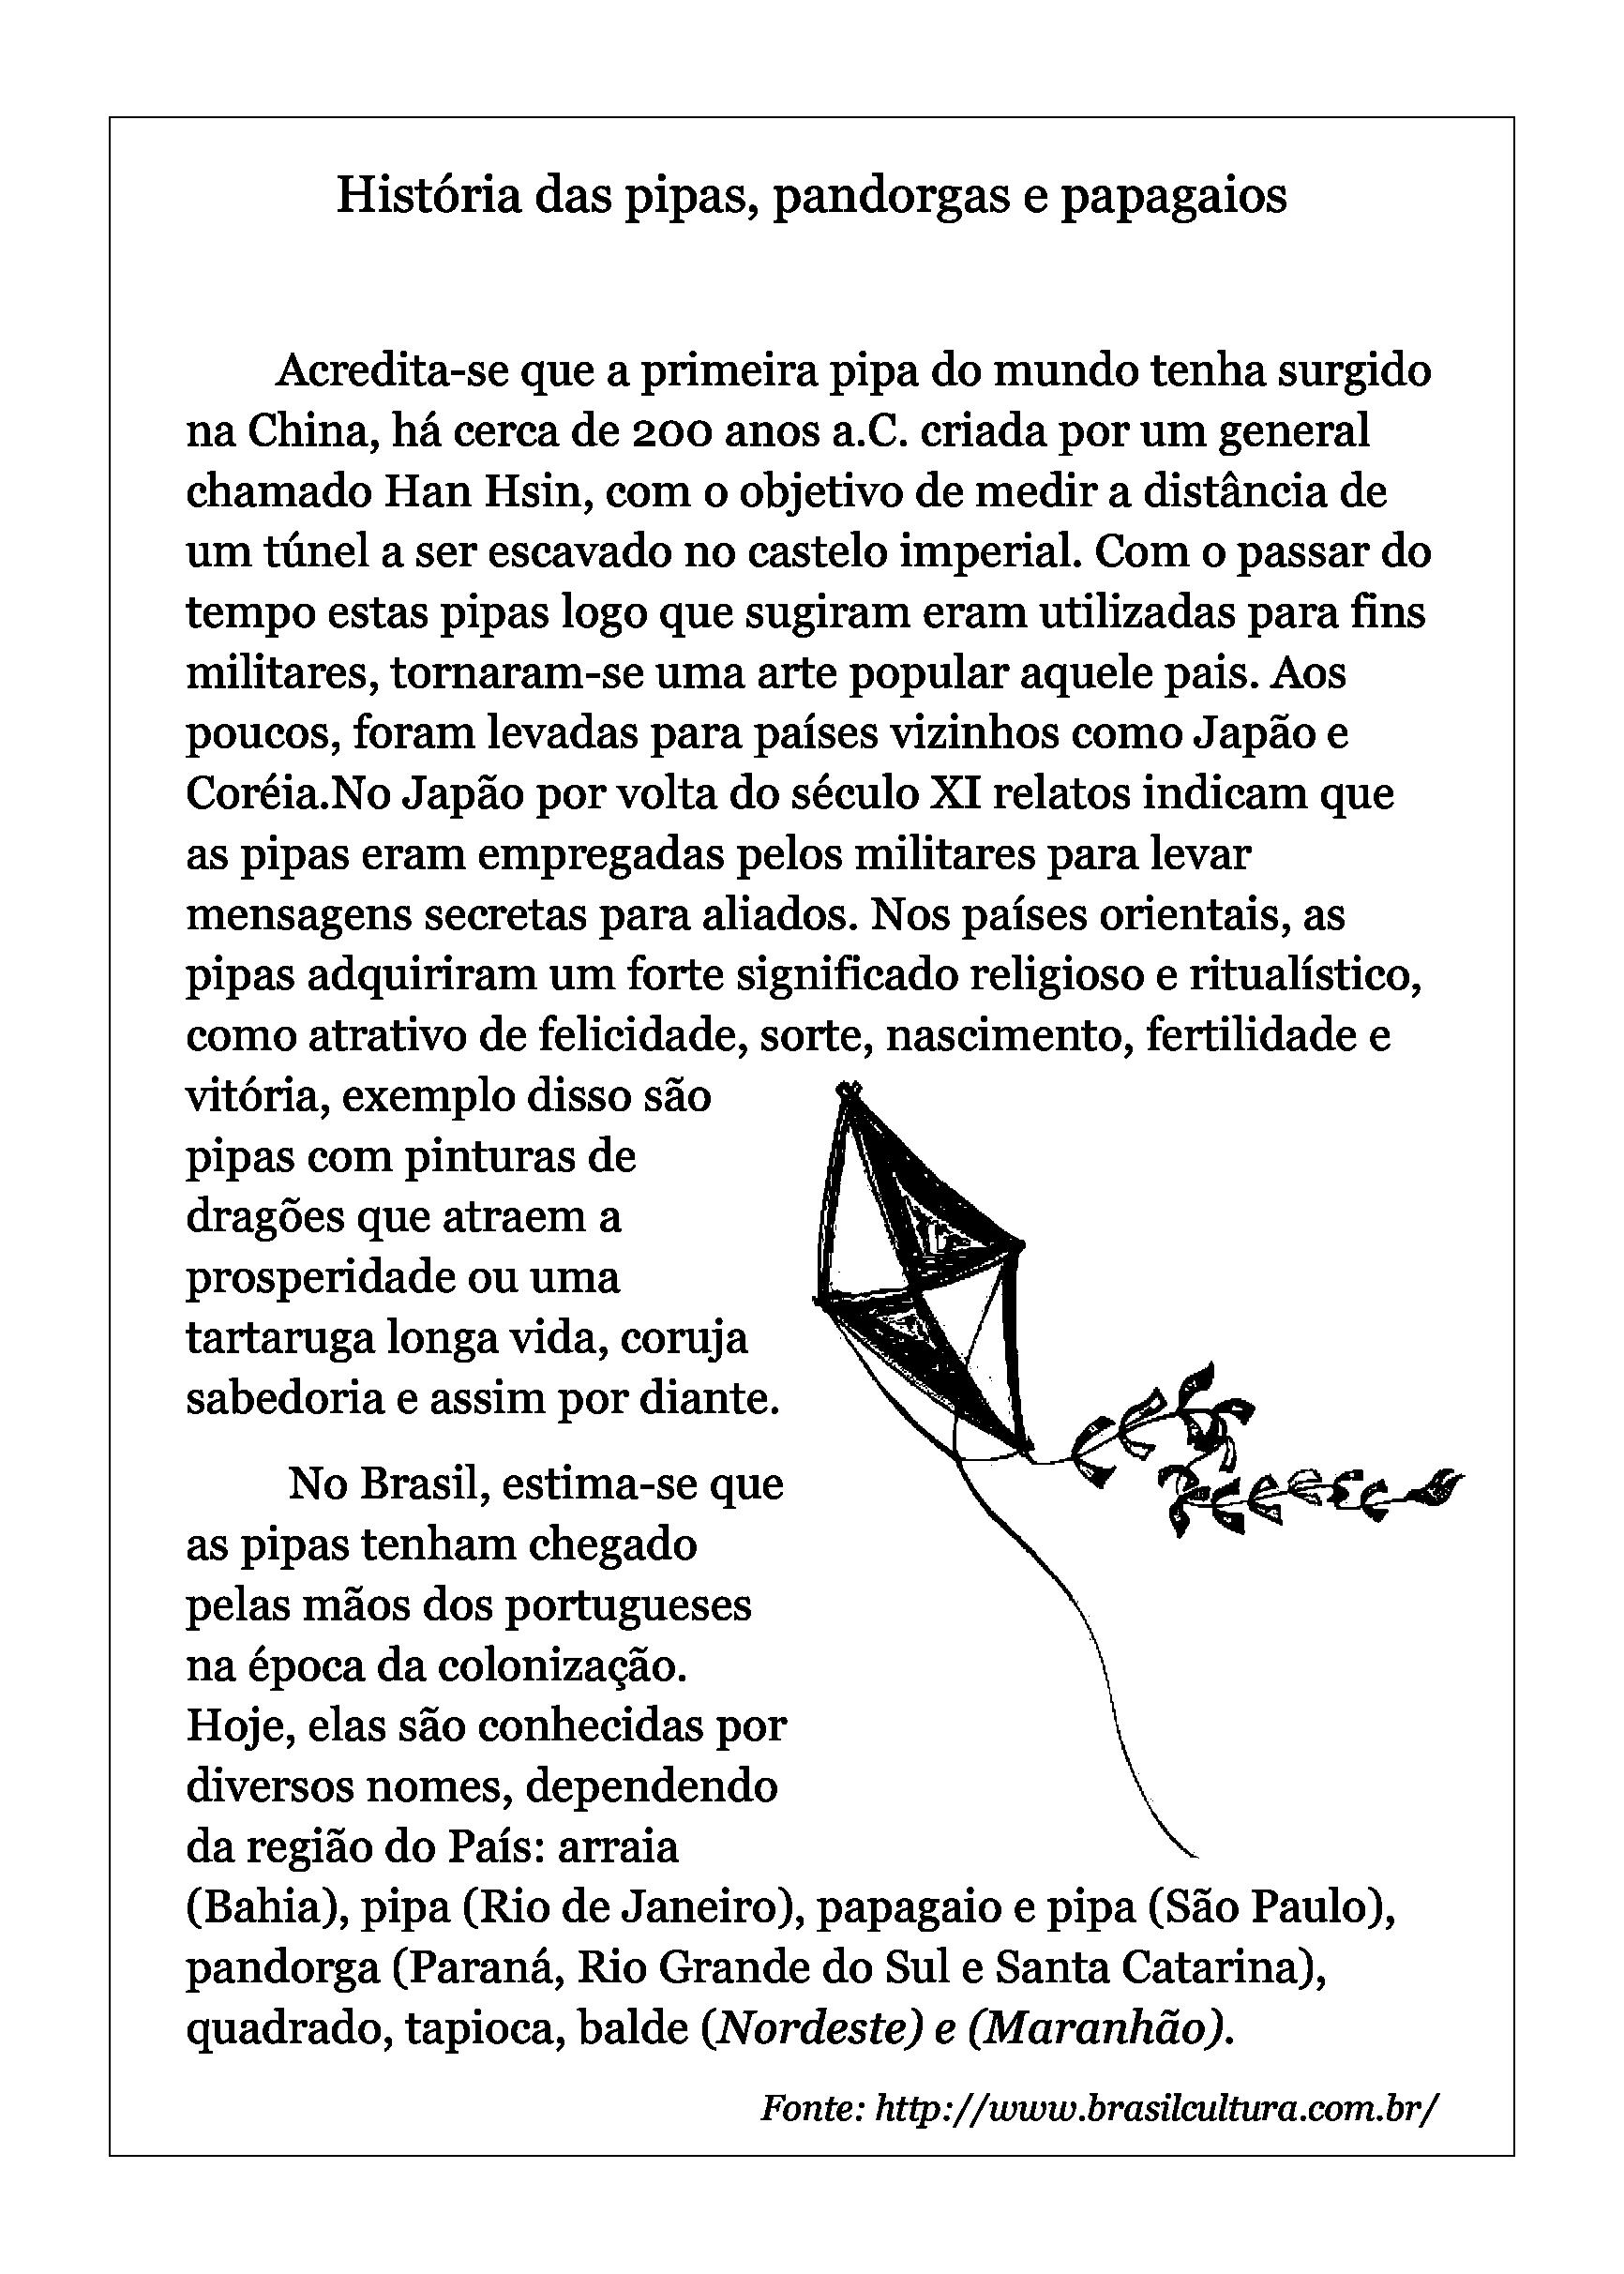 0189-folclore-historia-pipas